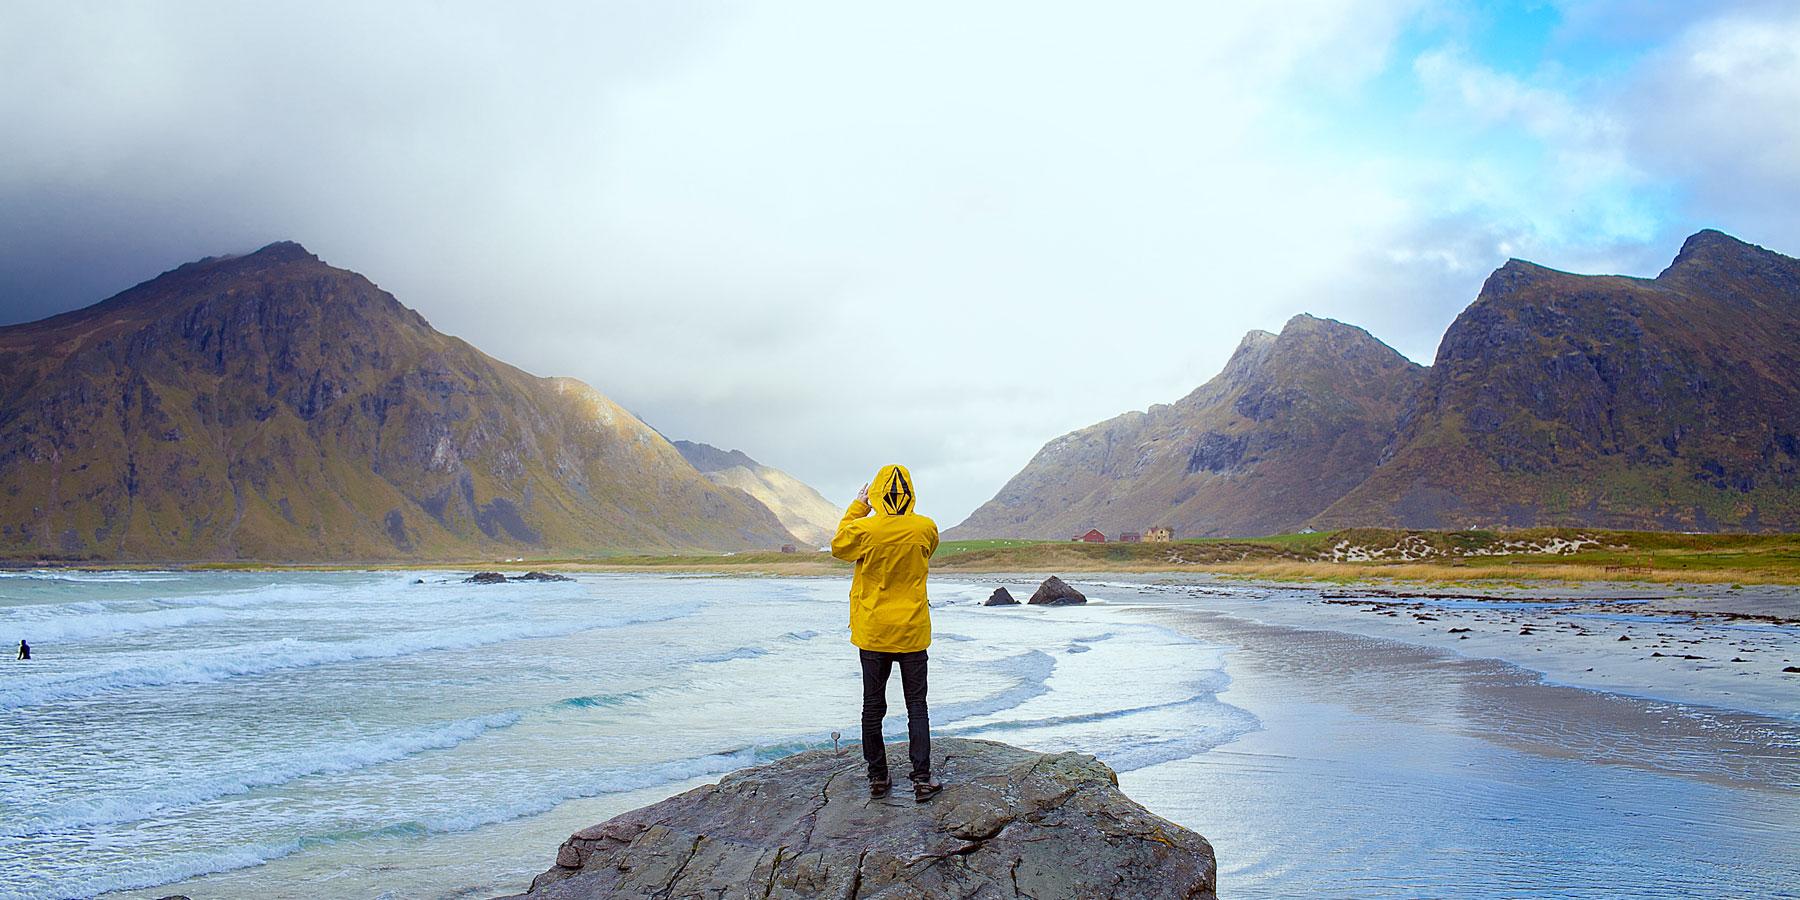 Capturing the landscape in Lofoten, Norway